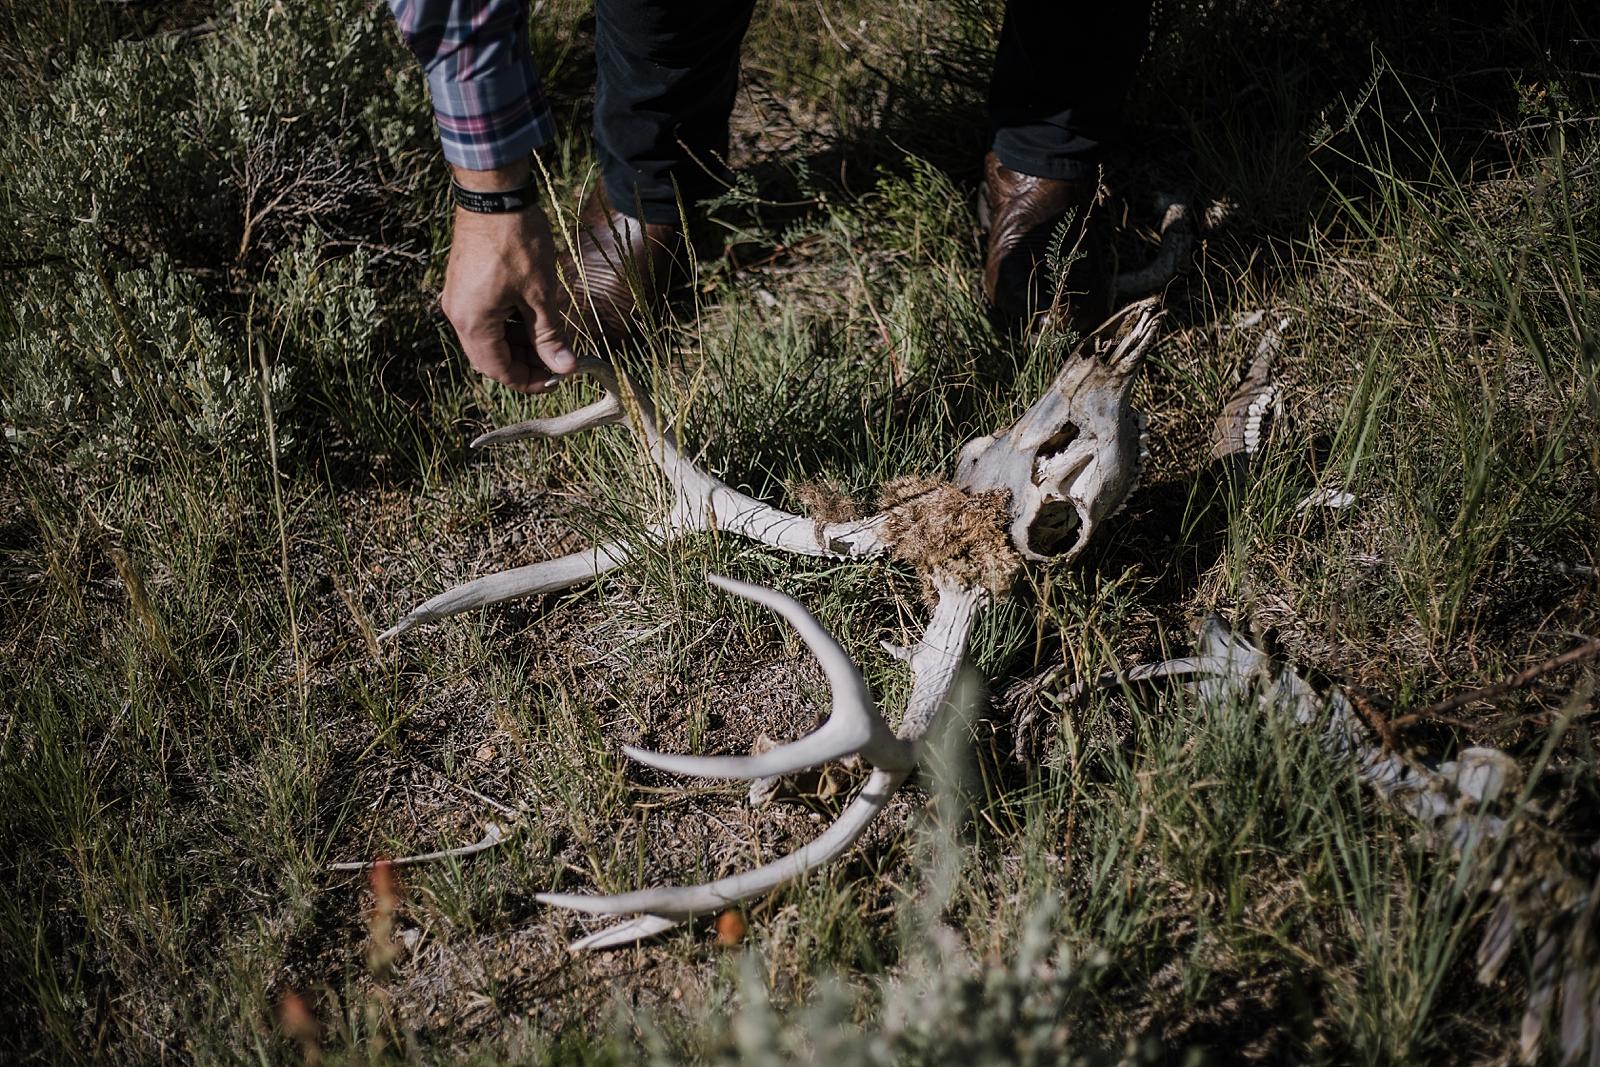 deer skull, RMNP elopement ceremony, rocky mountain national park elopement, 3M curves elopement, self solemnizing, self solemnization, long's peak, summer elopement, estes park elopement